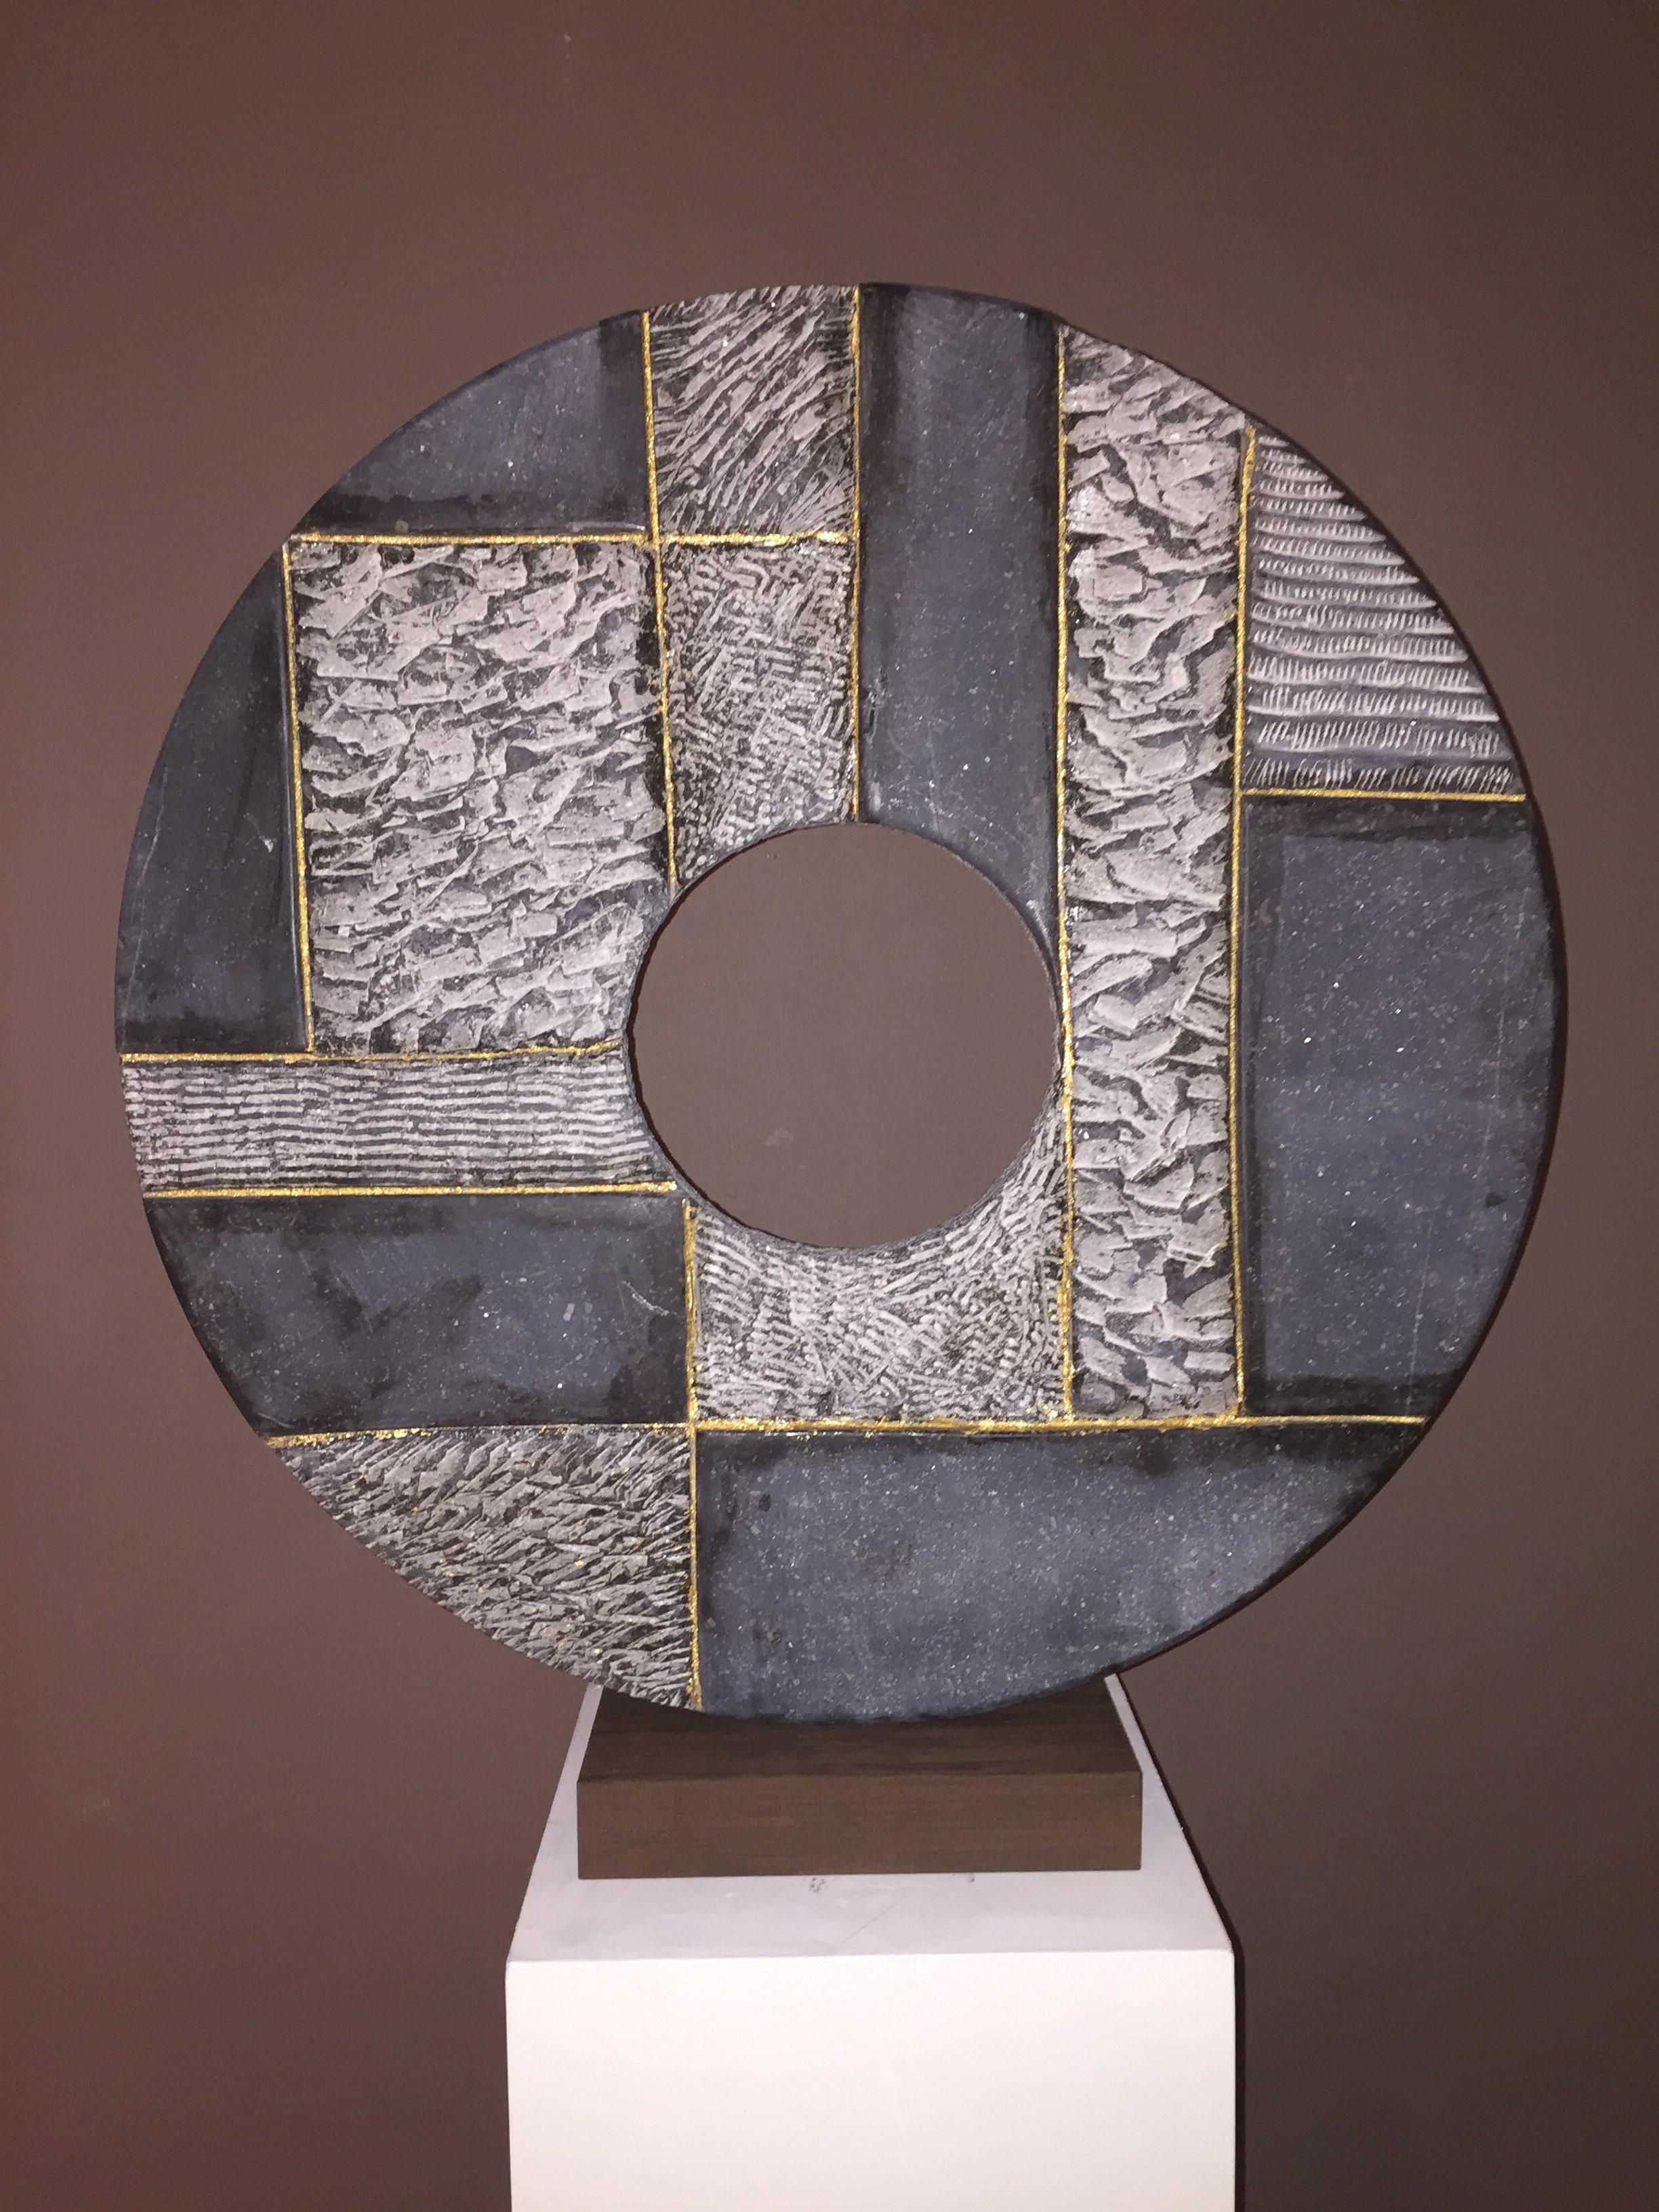 Alexia Weill : Circular Impressions series